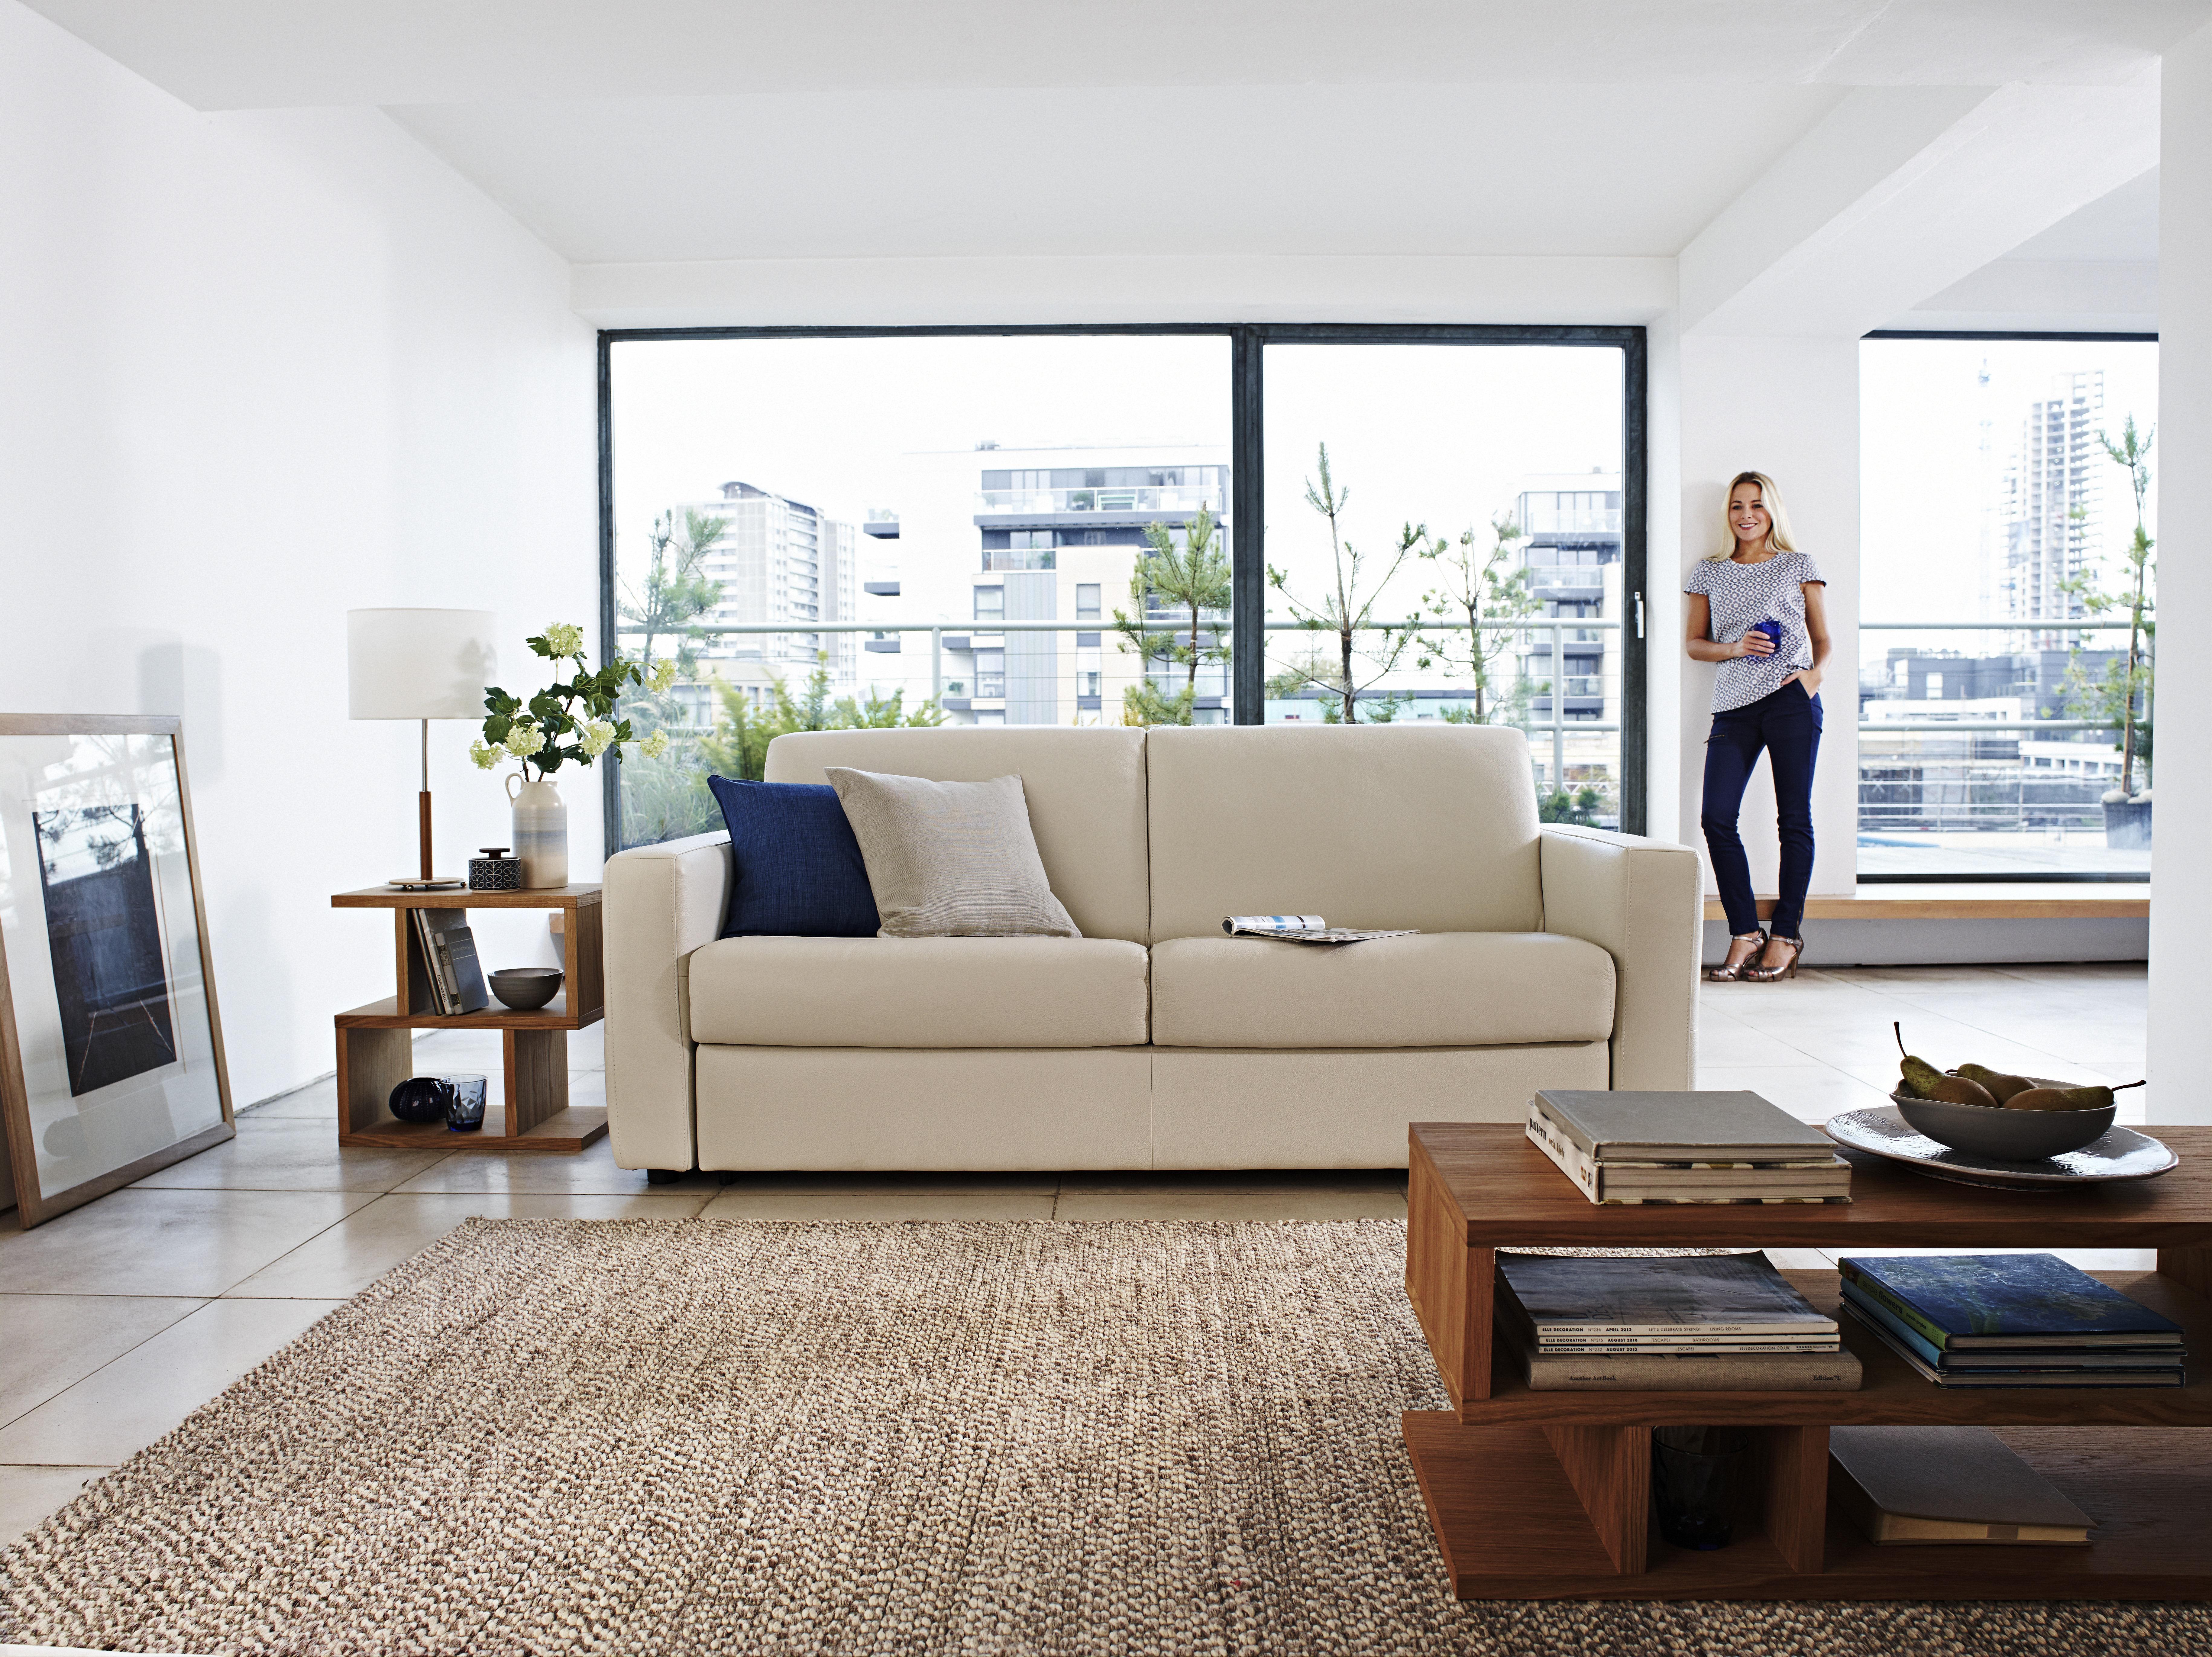 Arona sofa bed